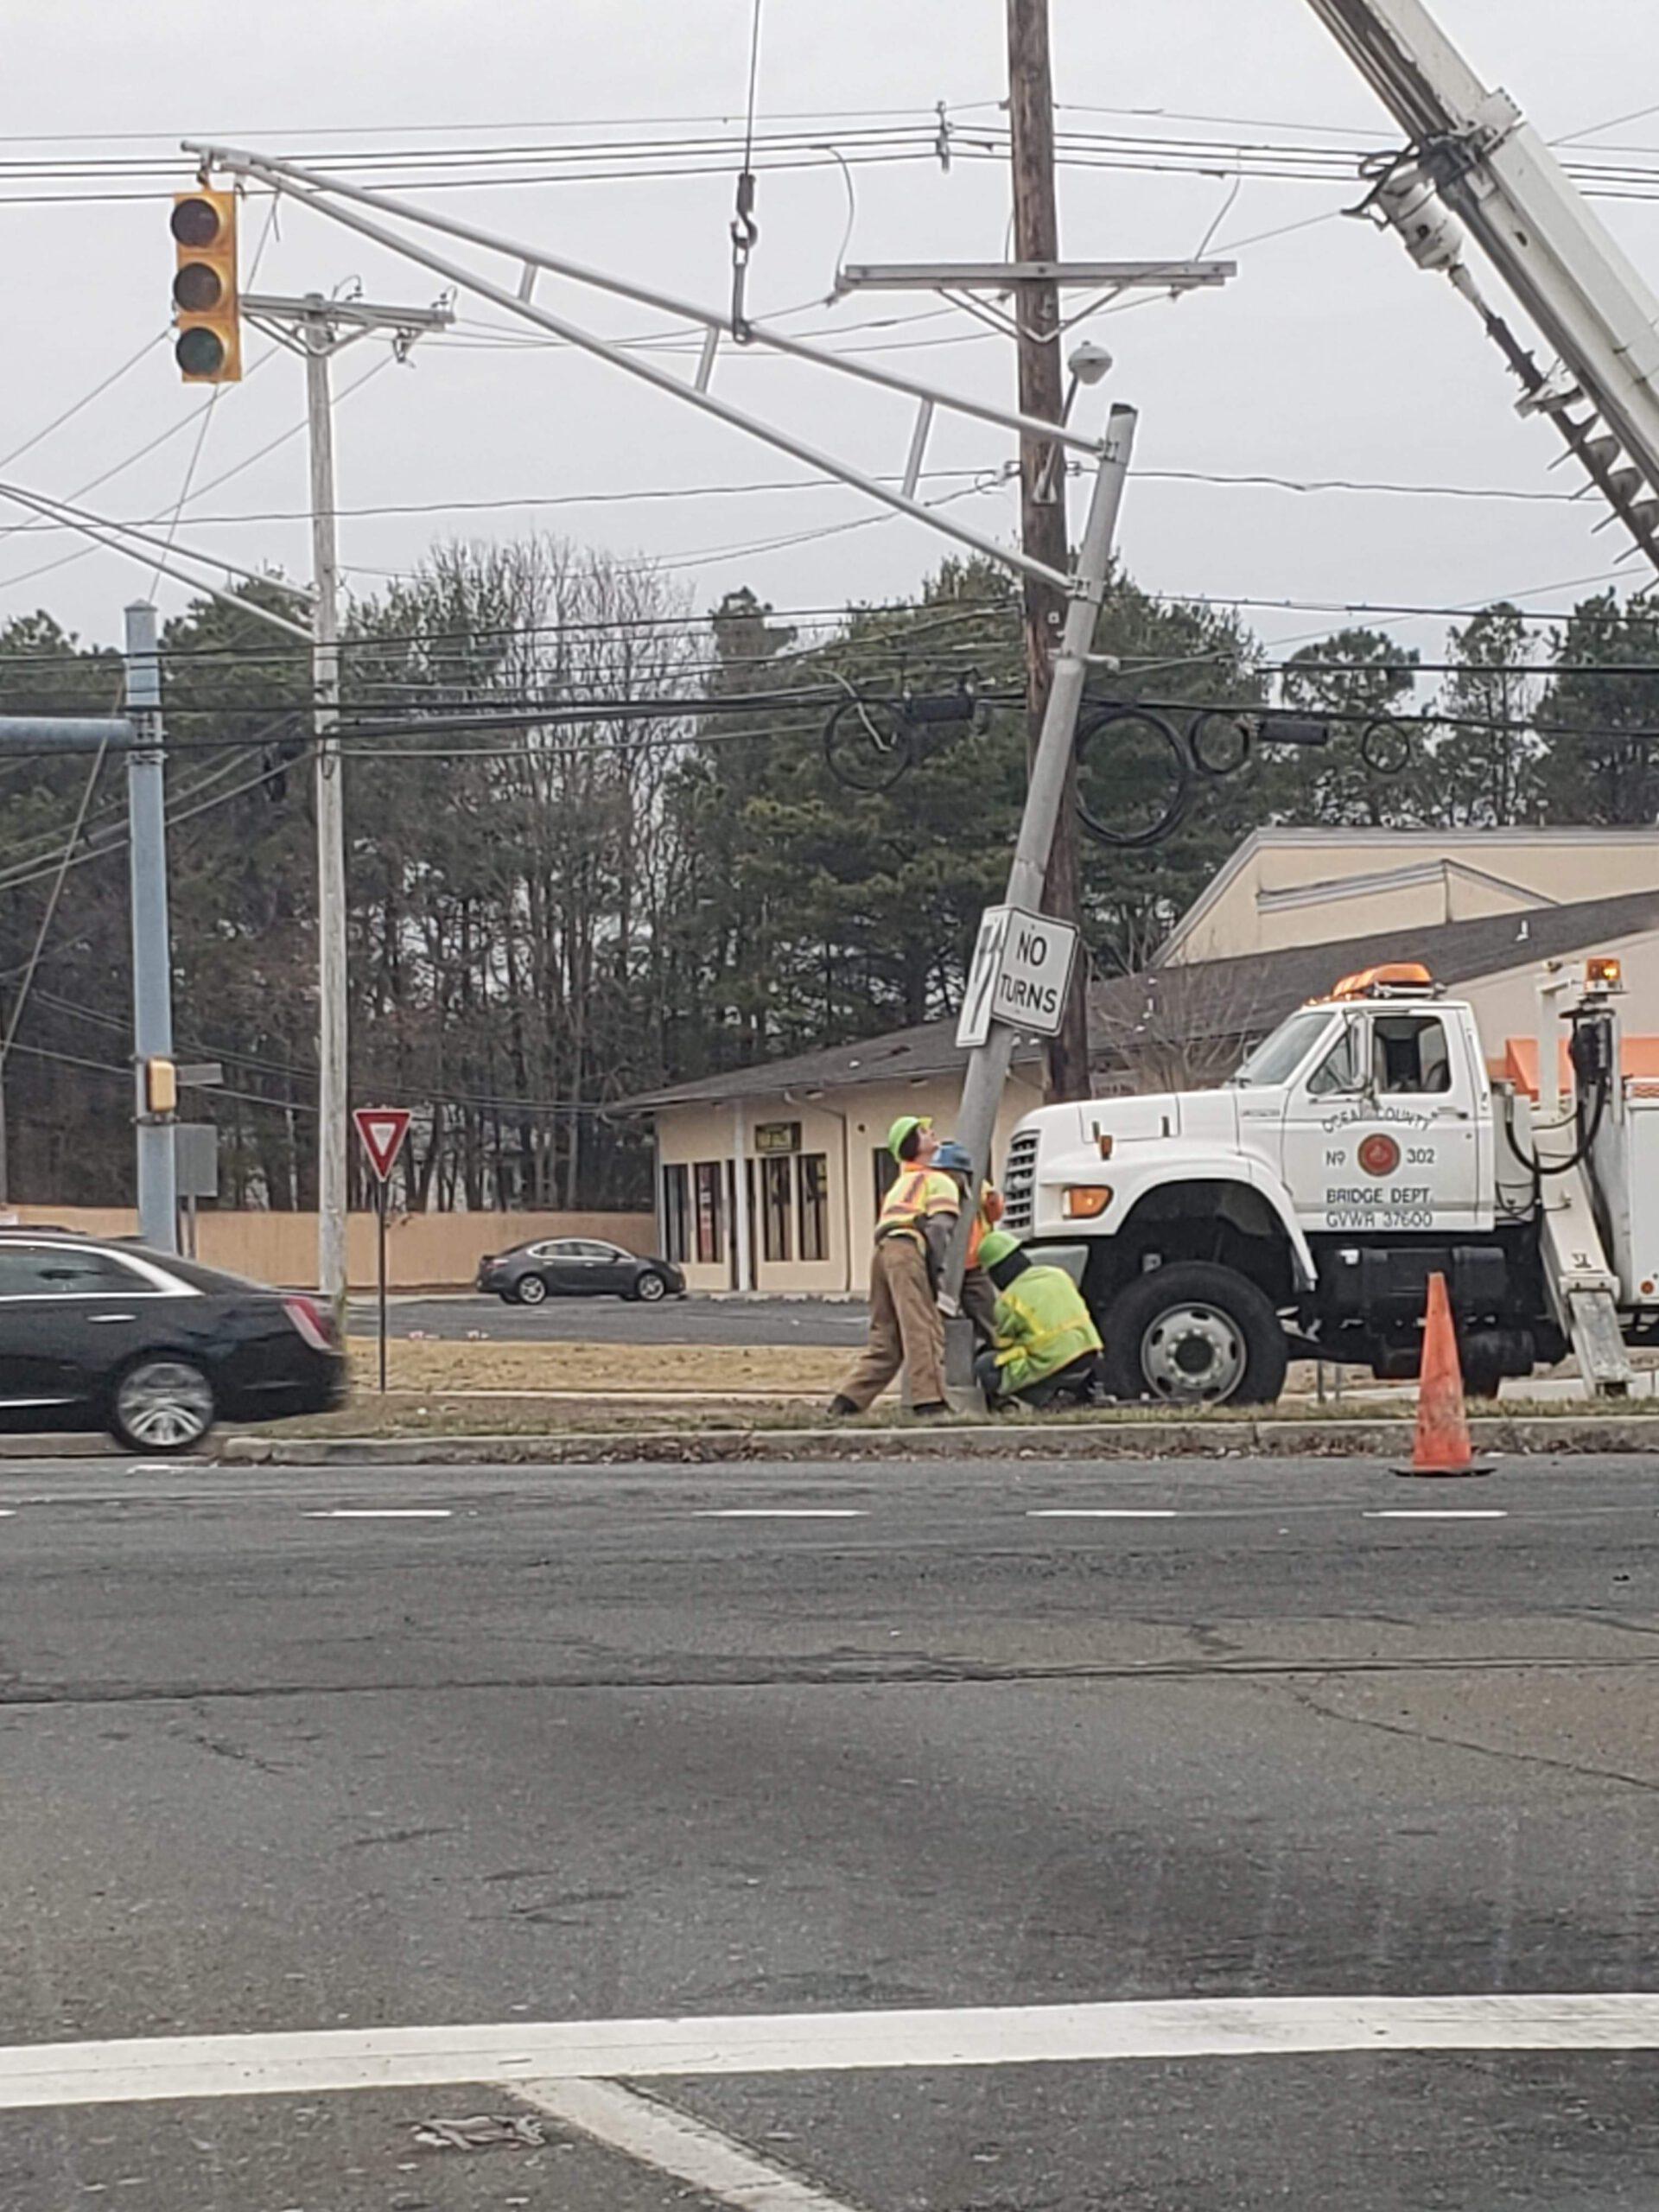 Brick : traffic light down